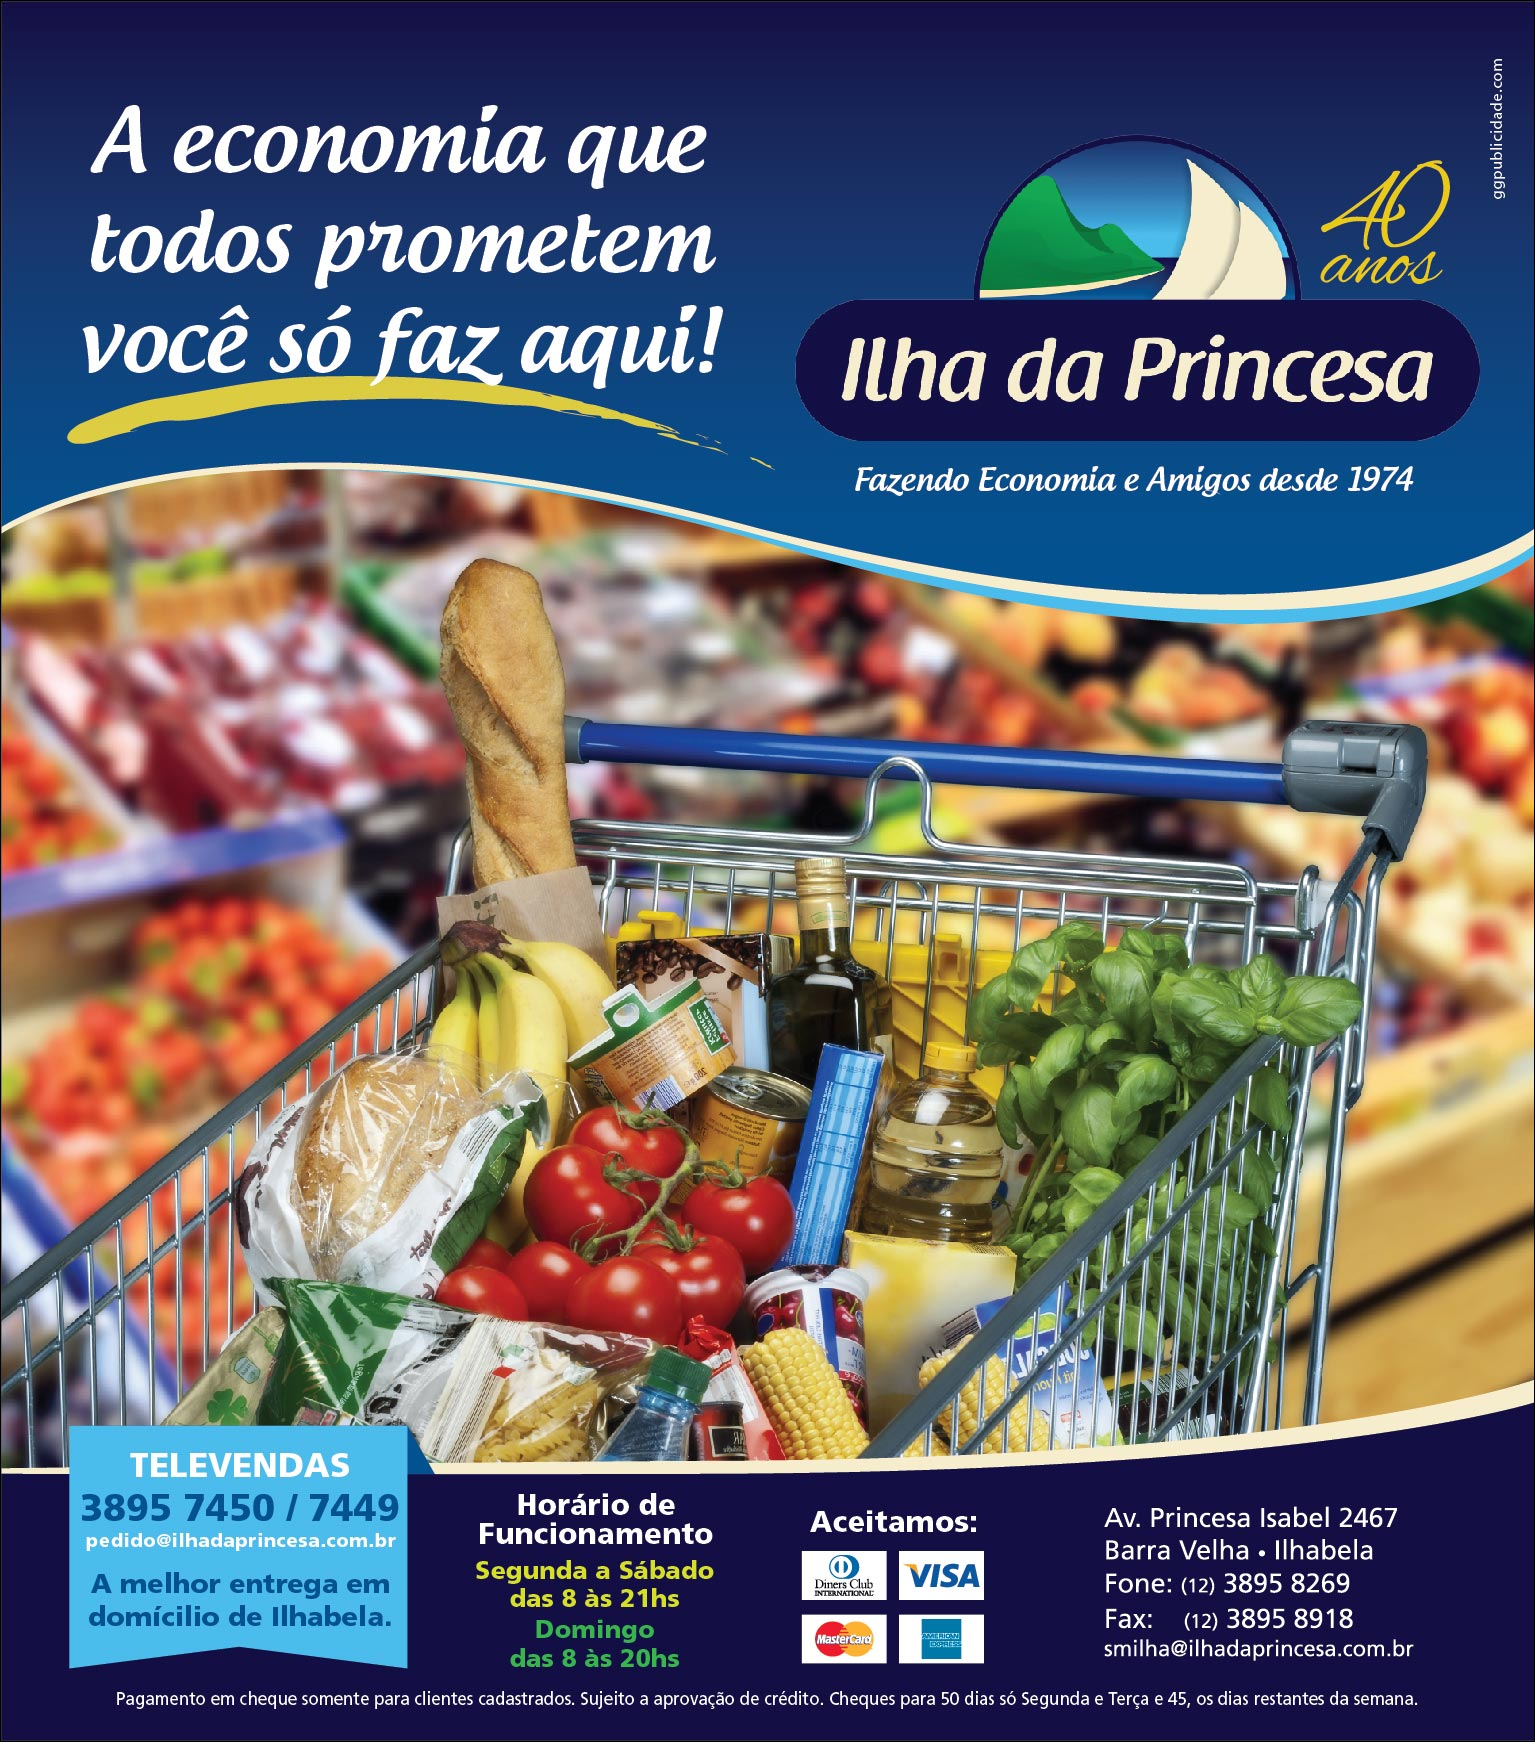 ILHA DA PRINCESA - ANÚNCIO